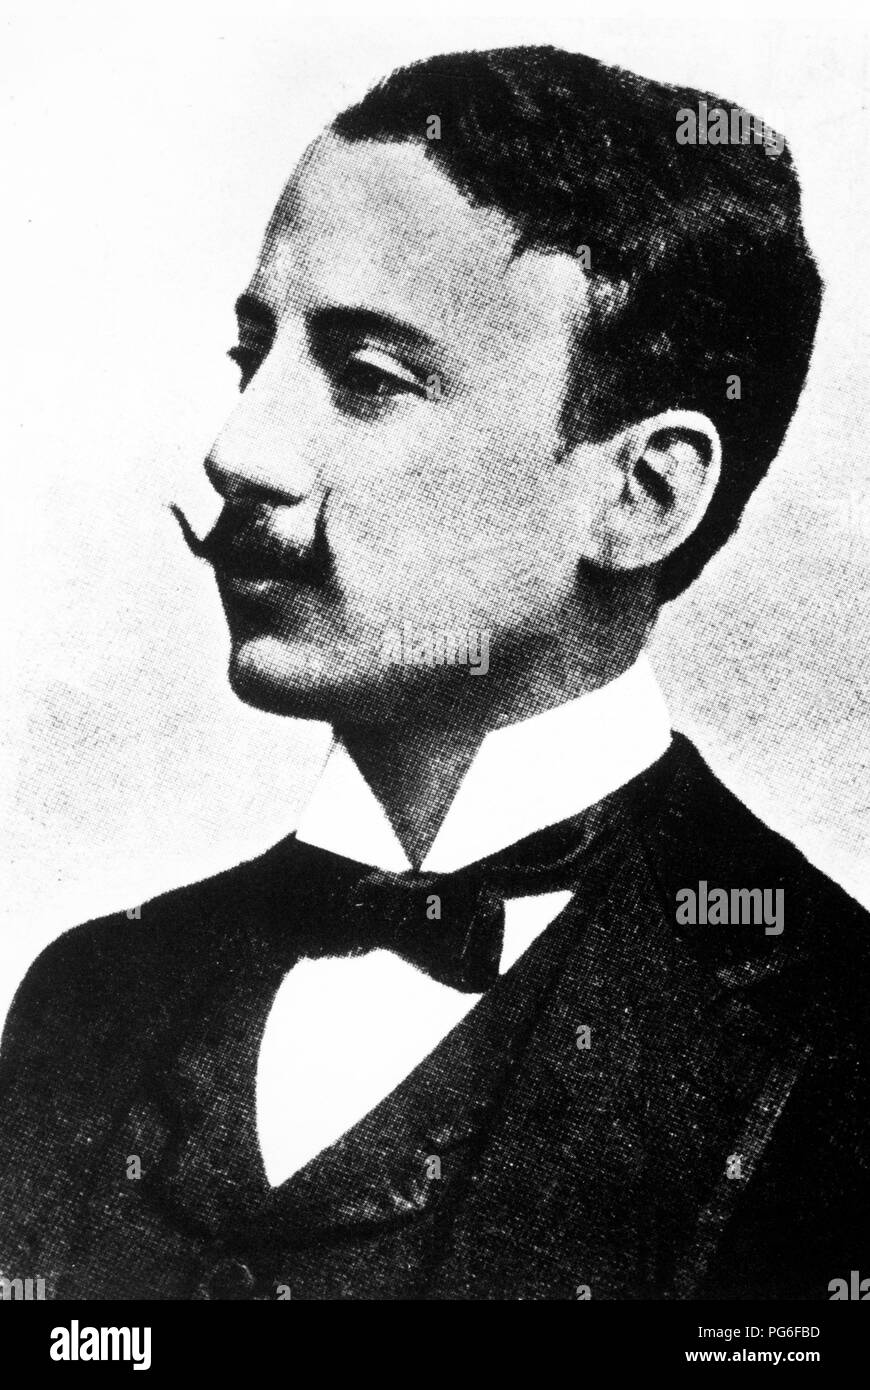 gabriele d'annunzio, 1903 - Stock Image